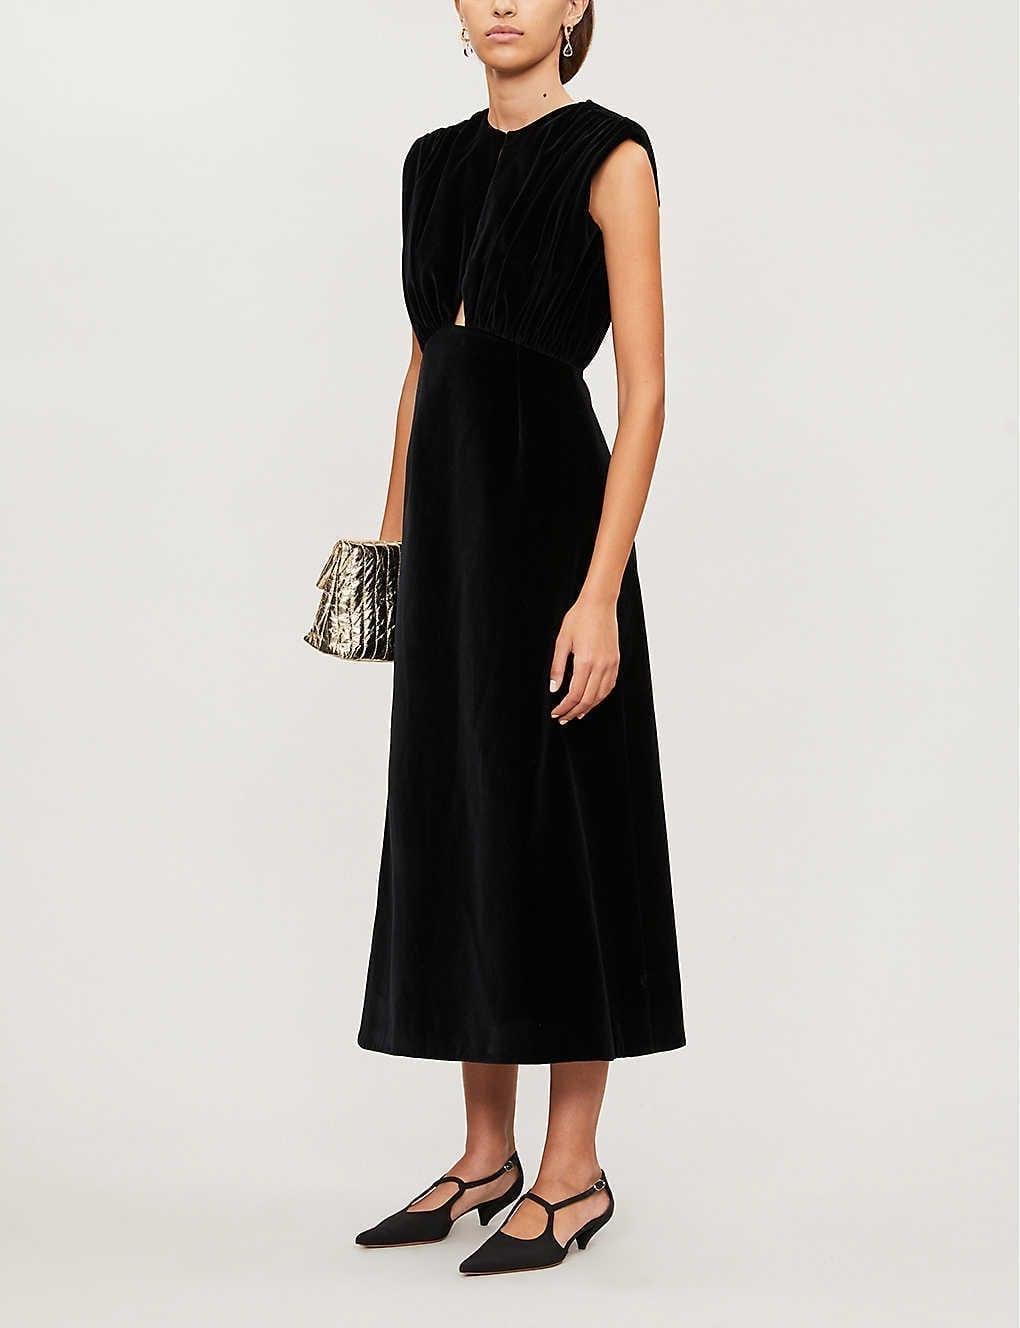 EMILIA WICKSTEAD Angelica Velvet Dress